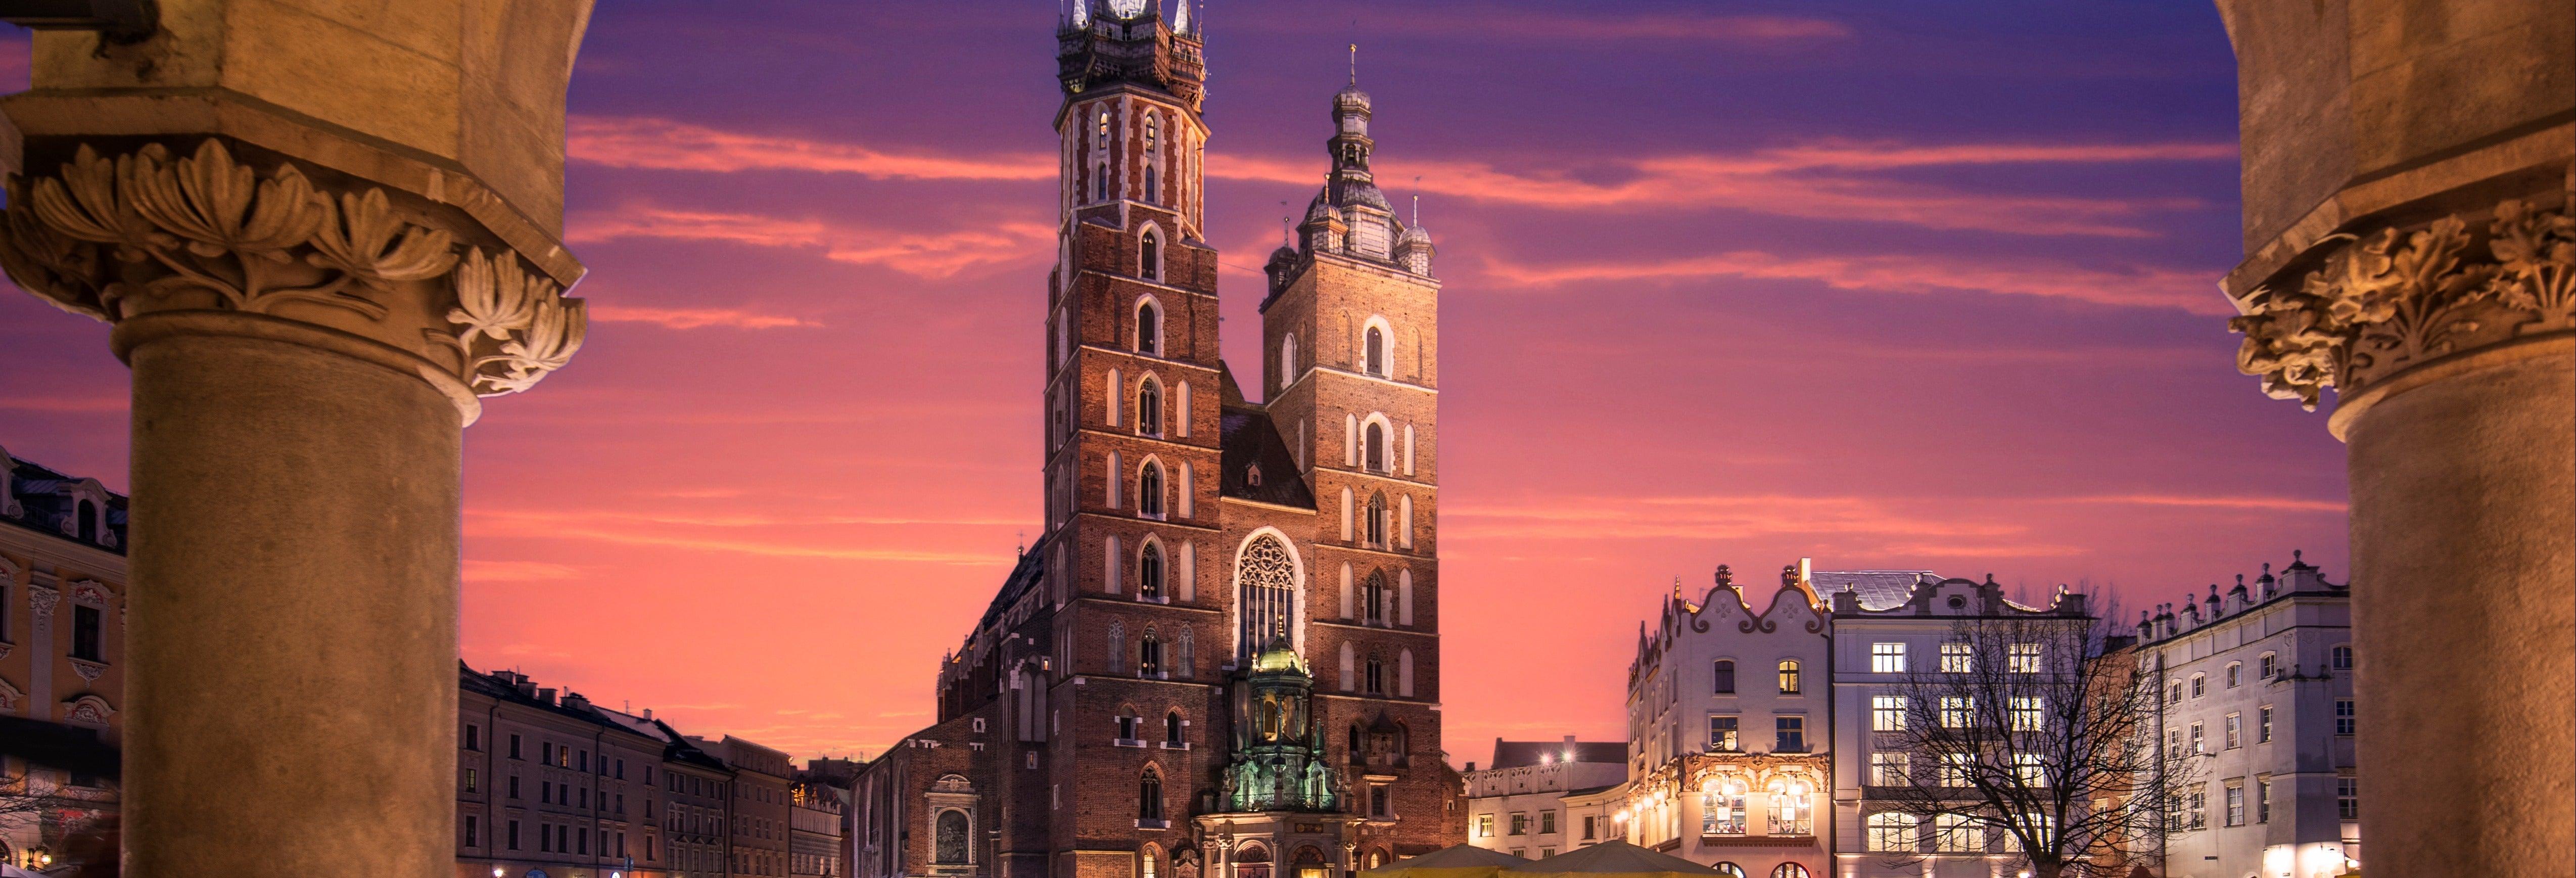 Free tour di Cracovia, fra misteri e leggende